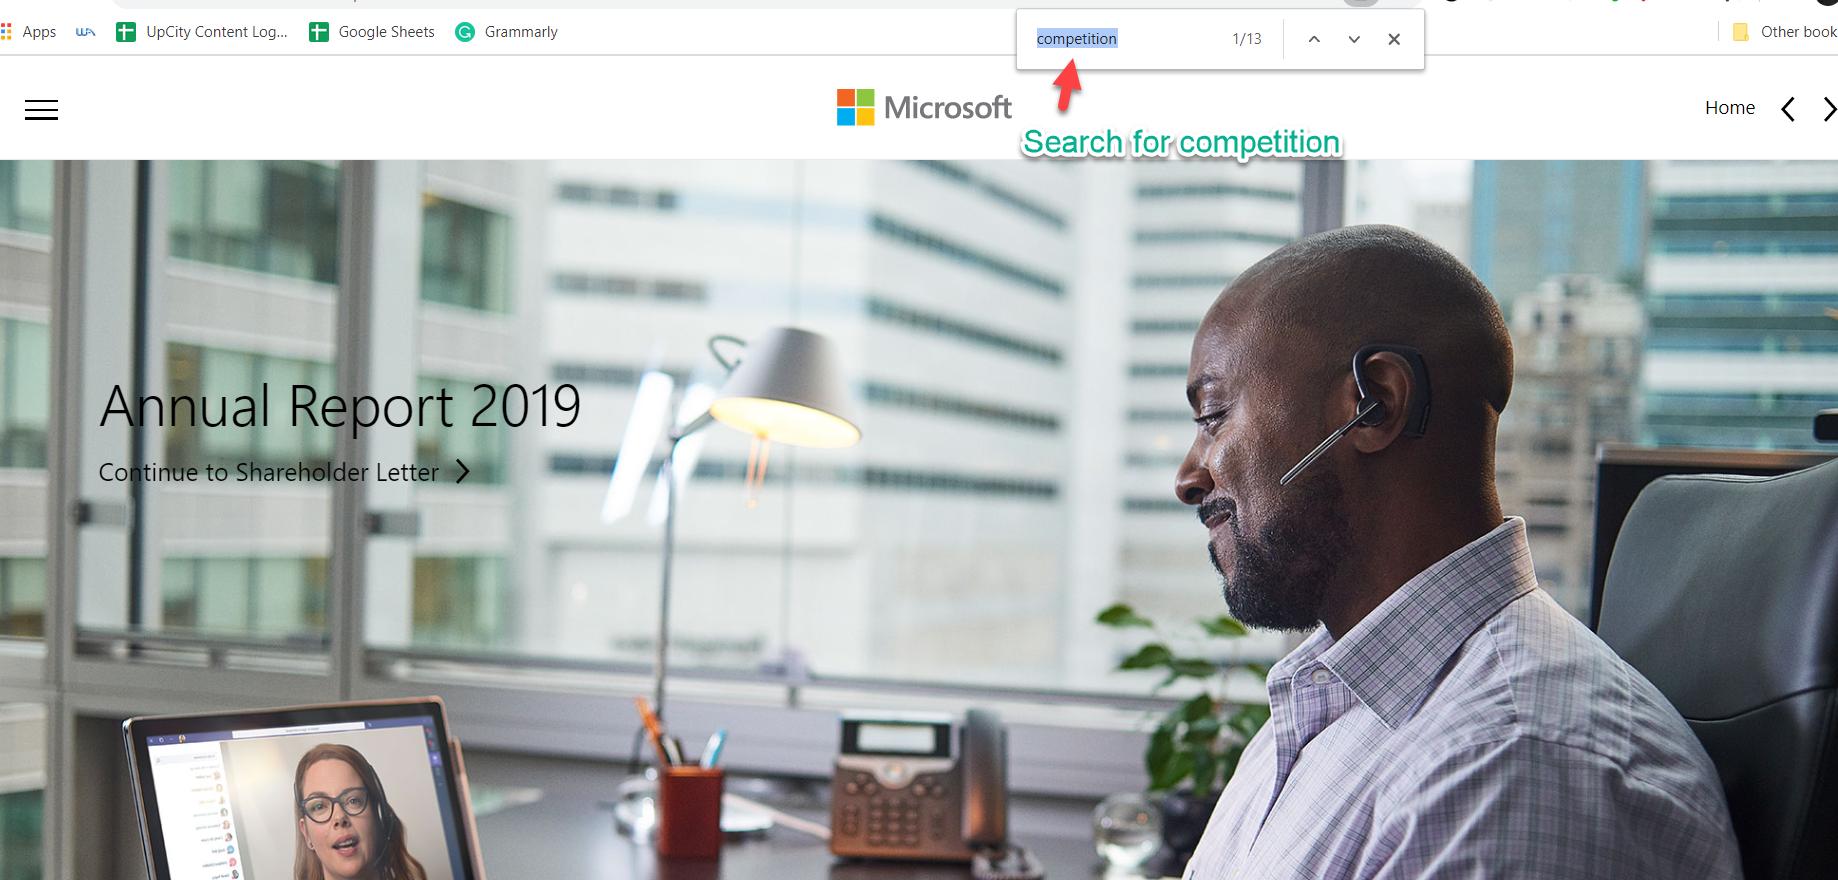 Microsoft Annual Report Top Search Bar